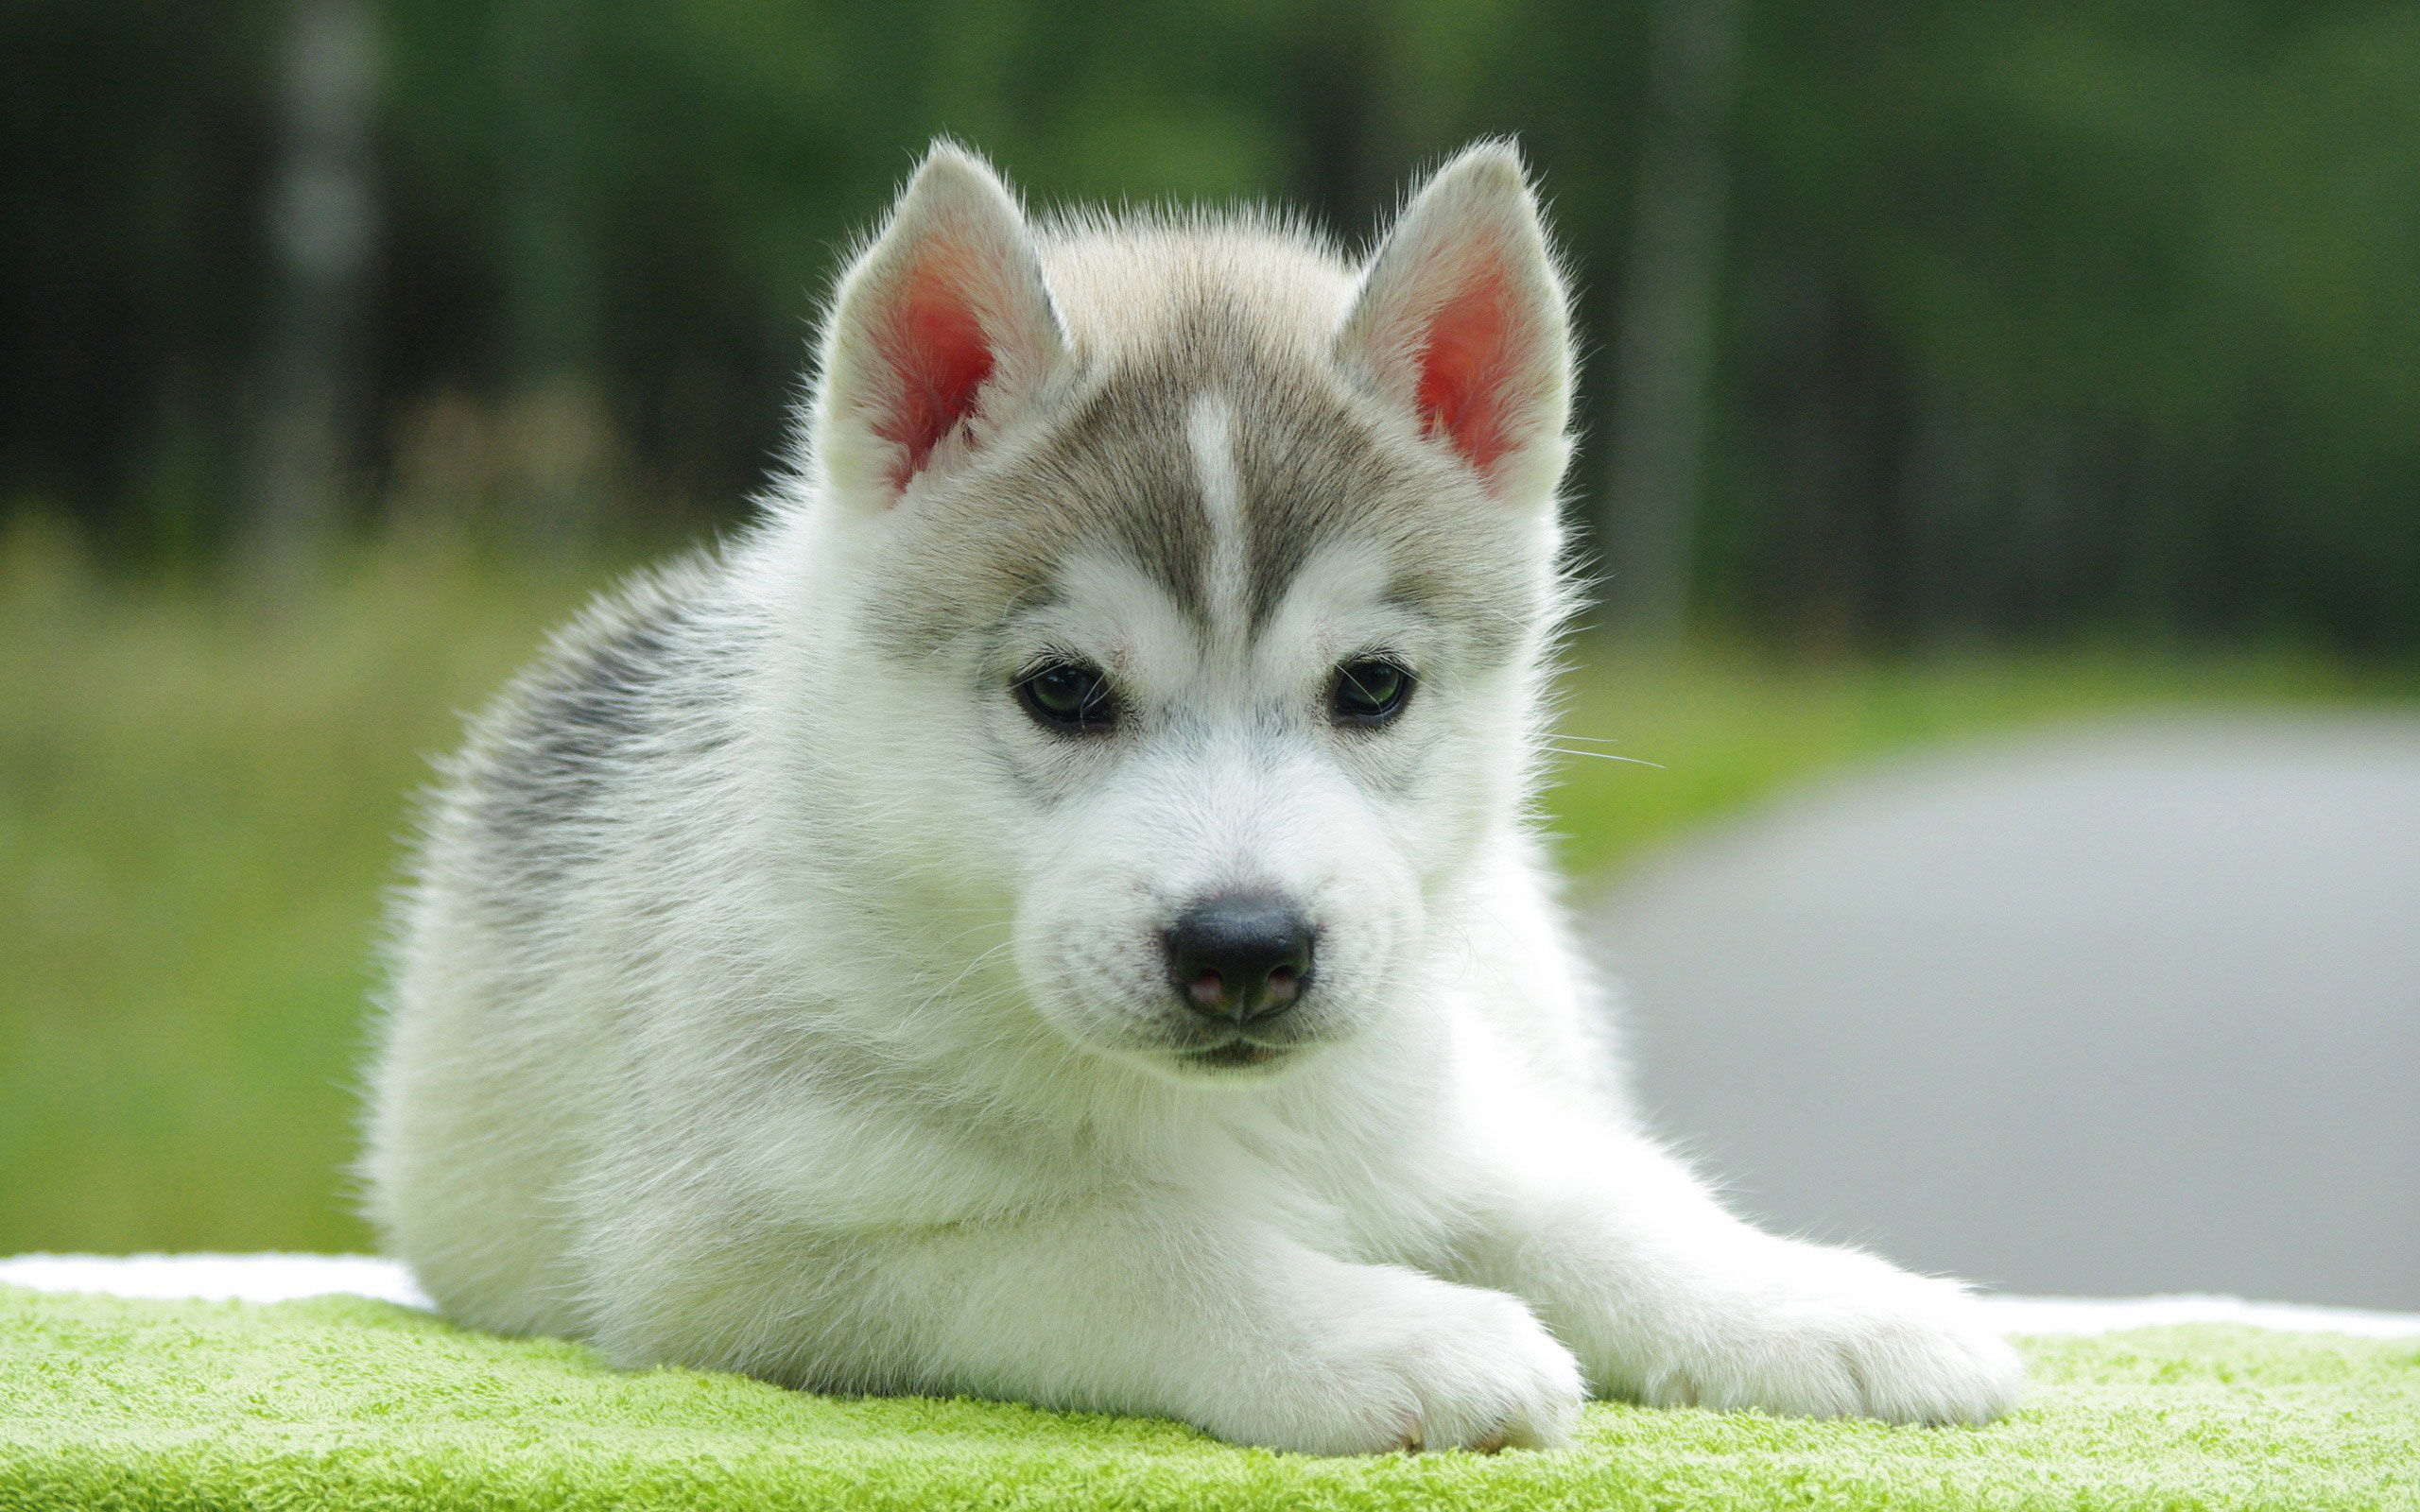 Cute Husky Puppy   Wallpaper High Definition High Quality 2560x1600